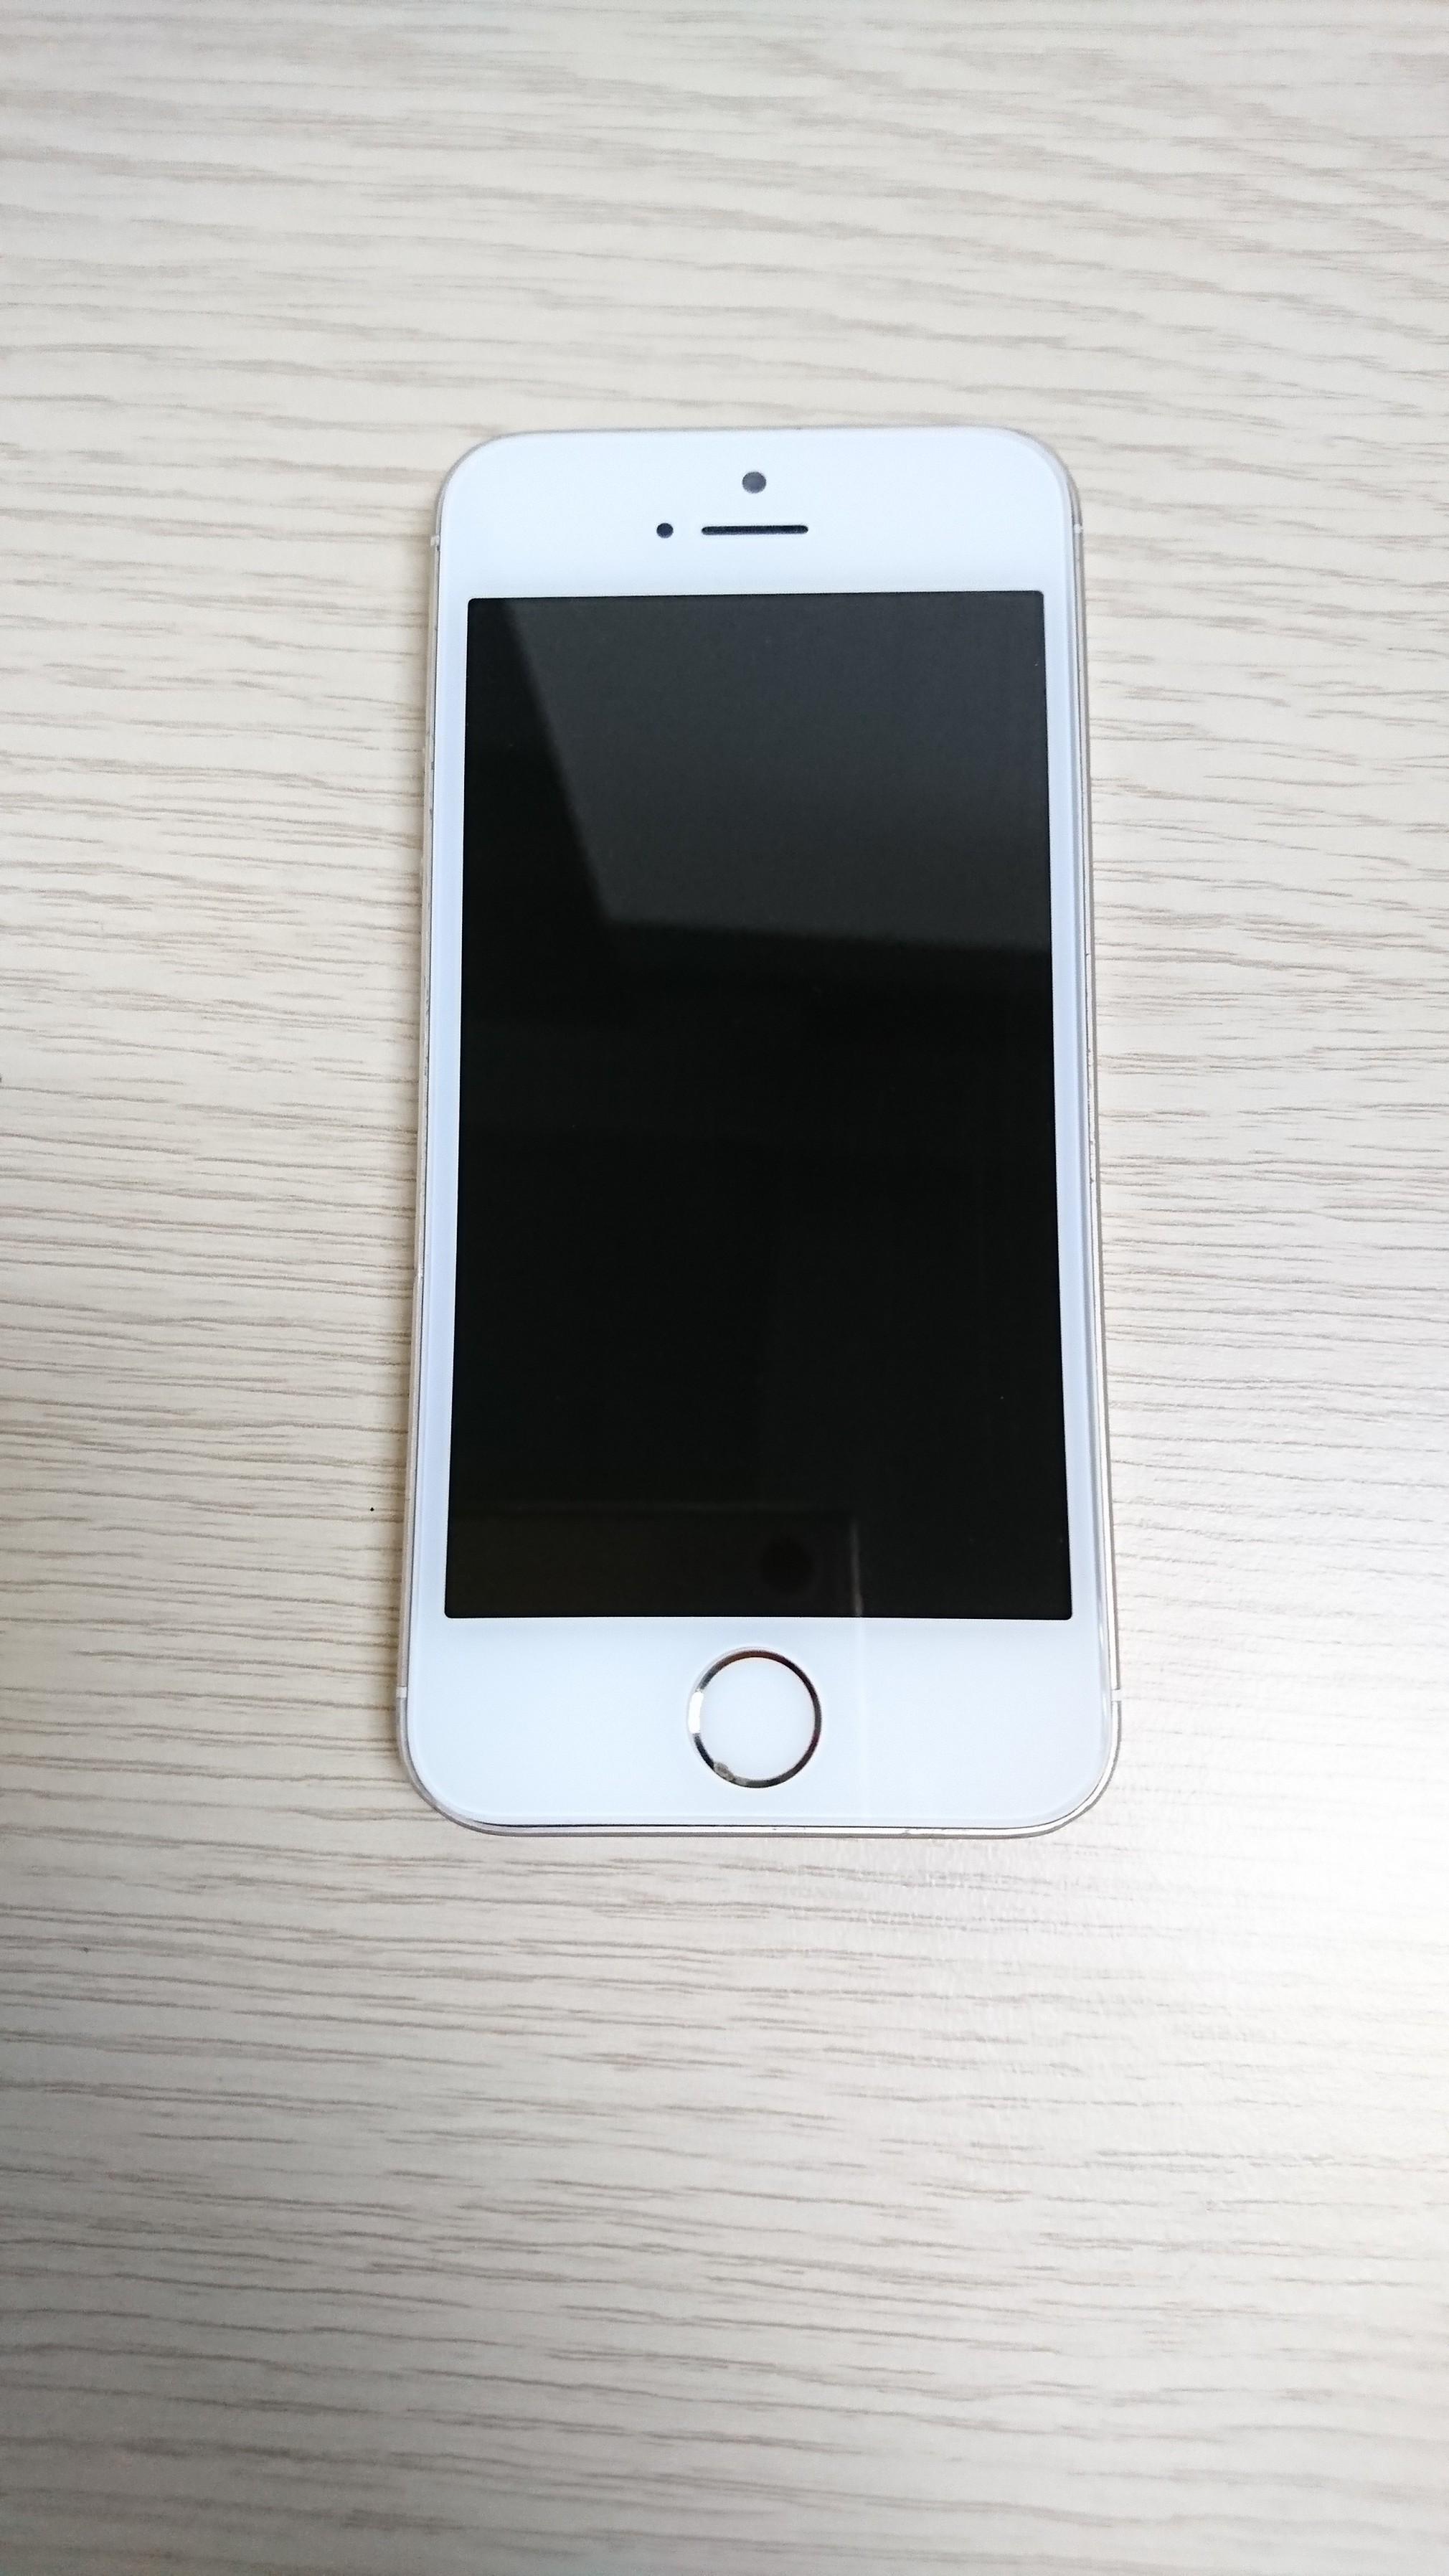 ... 011-11516934 Specification 4G LTE Nano Sim 4.0 in LCD display IOS 10  1GB RAM 16GB storage 8MP camera 1.2MP selfie camera Fingeprint 1560 mAh  Battery ef396a025d